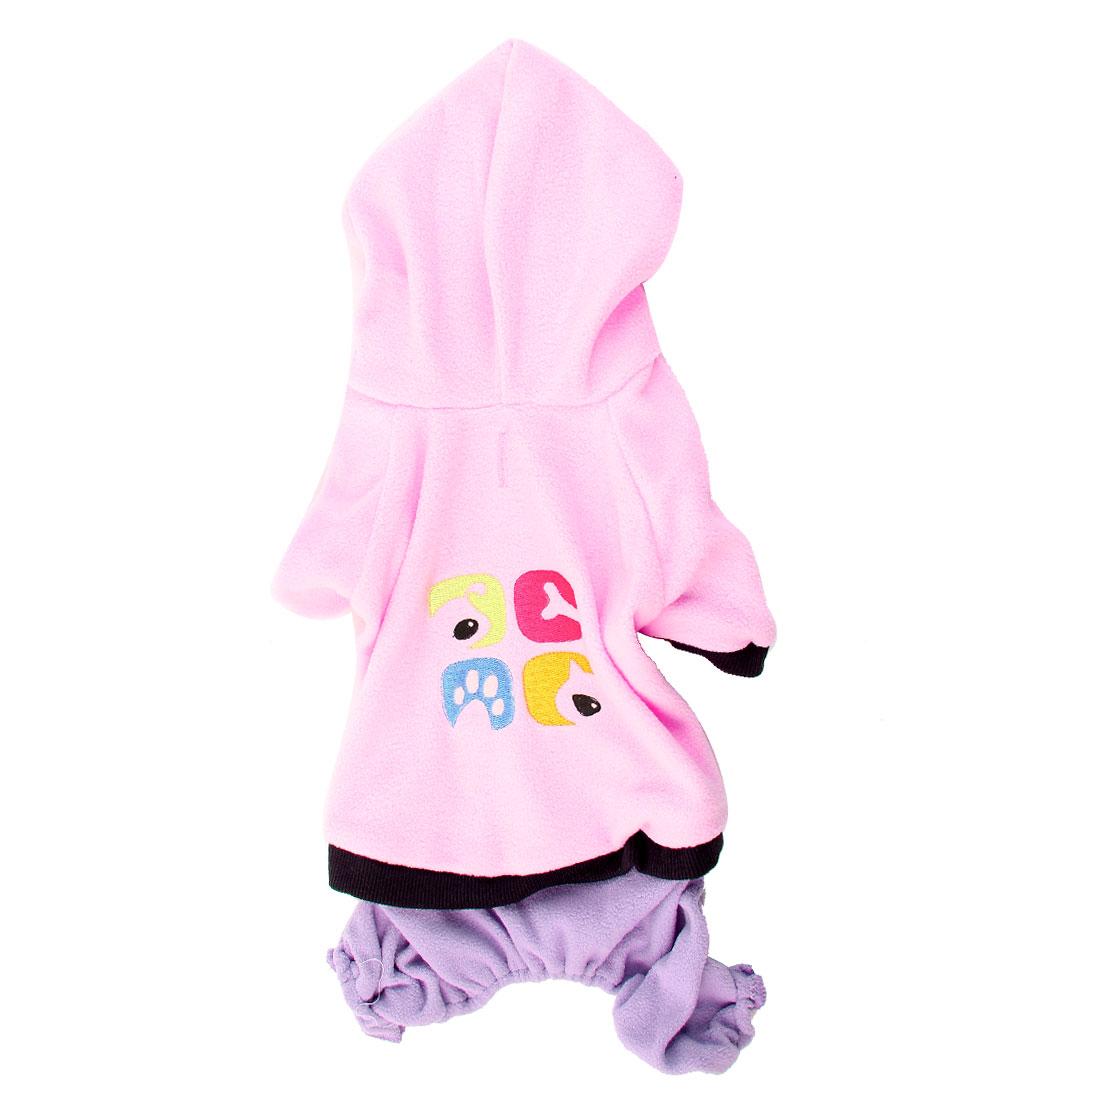 Single Breasted Hoodie Pet Dog Puppy Jumsuit Jumper Coat Purple Pink M